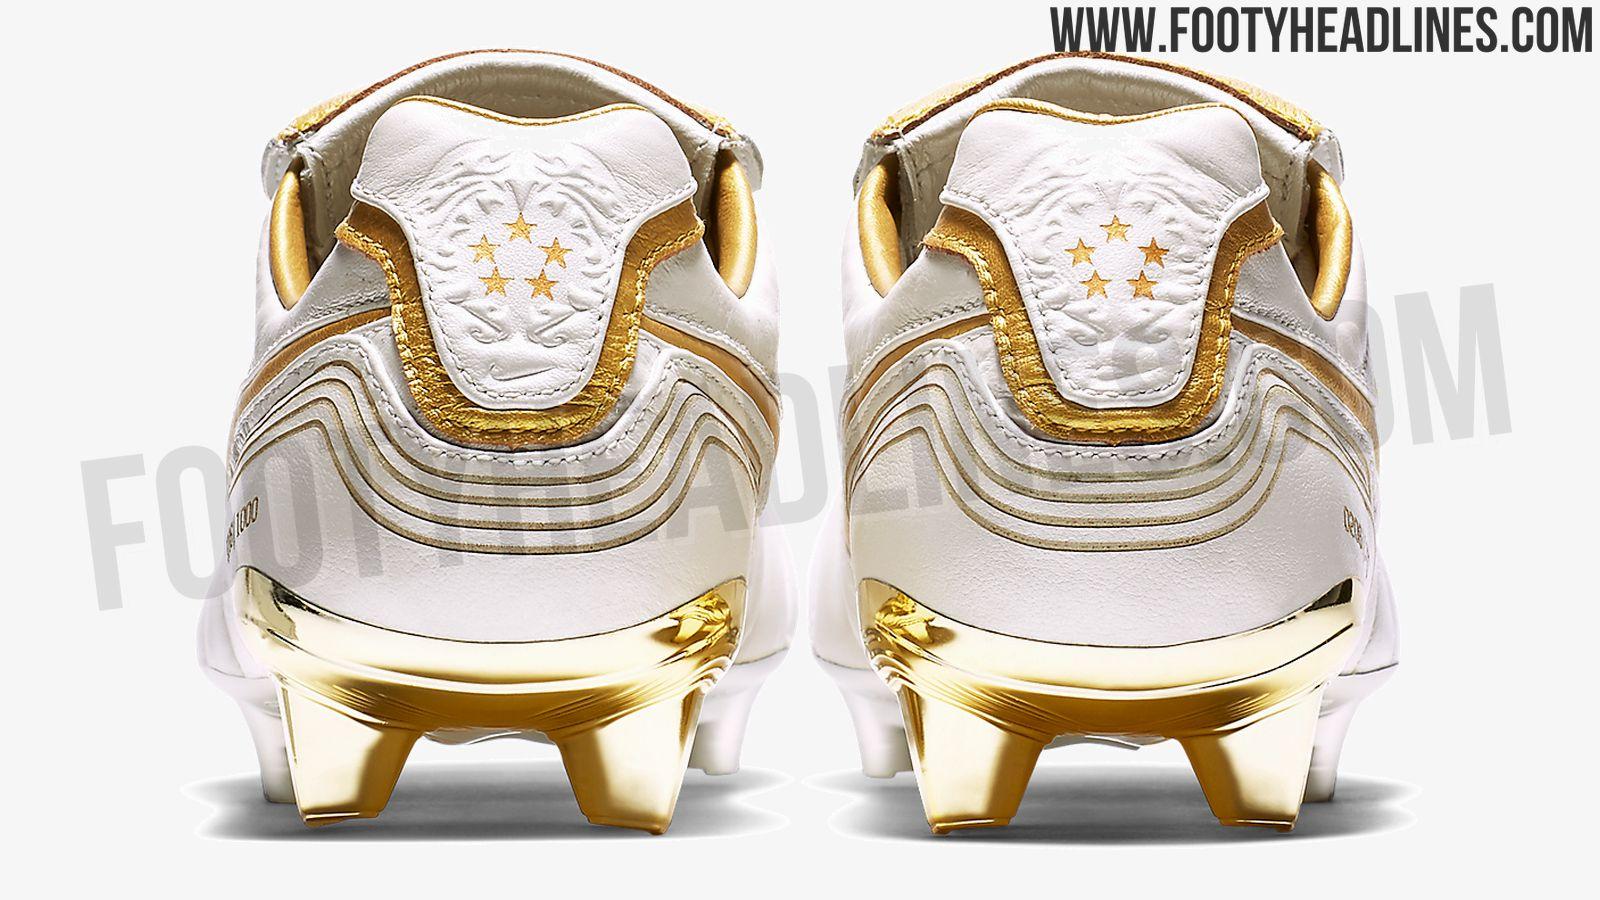 buy popular e3dda c7c87 Nike Release Remake Of 2005 Tiempo's Worn By Ronaldinho ...